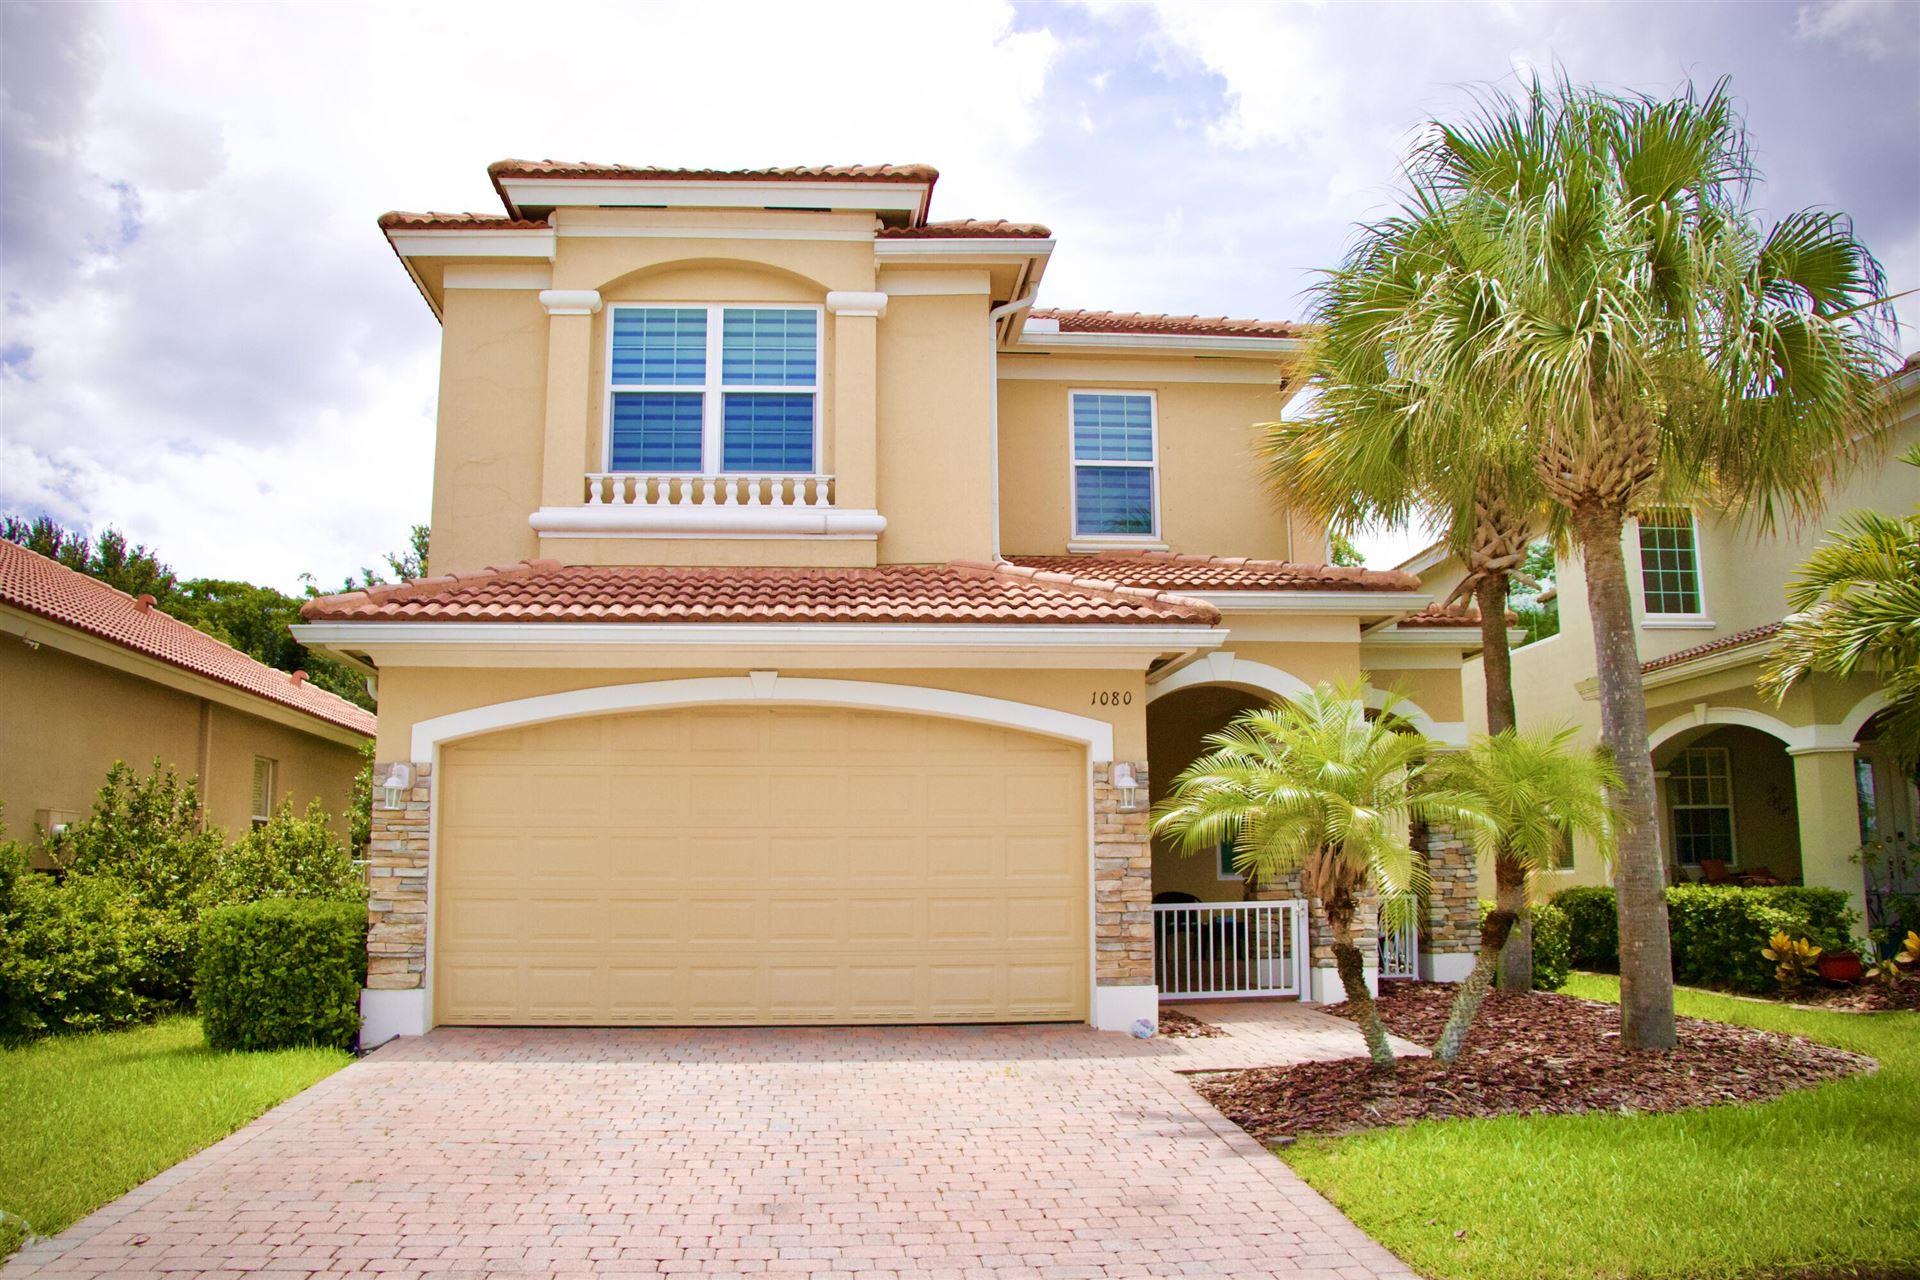 1080 NW Leonardo Circle, Port Saint Lucie, FL 34986 - MLS#: RX-10732968